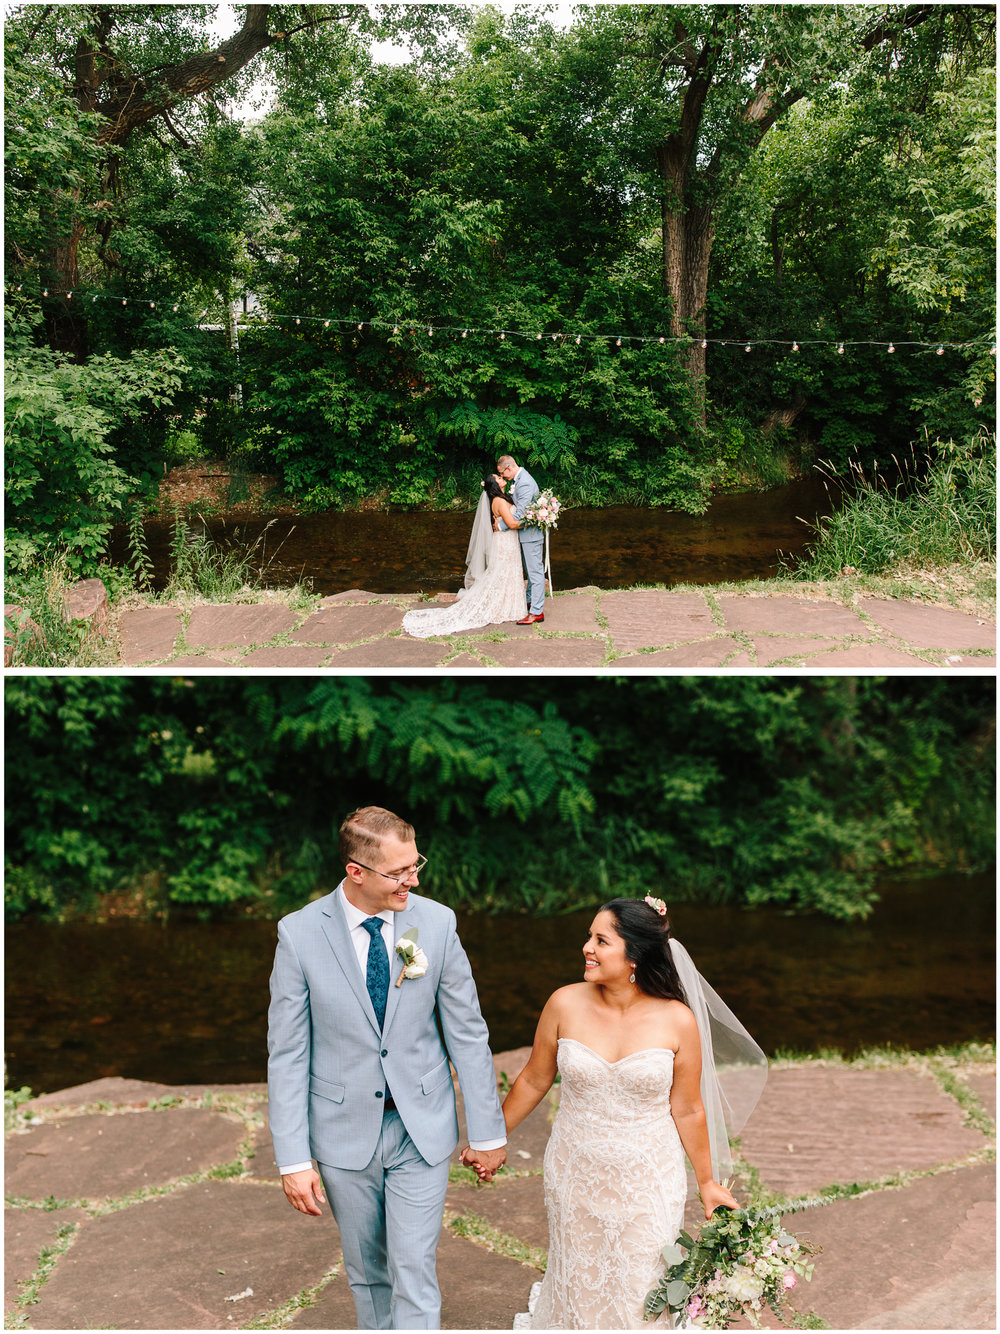 lyons_farmette_wedding_47.jpg